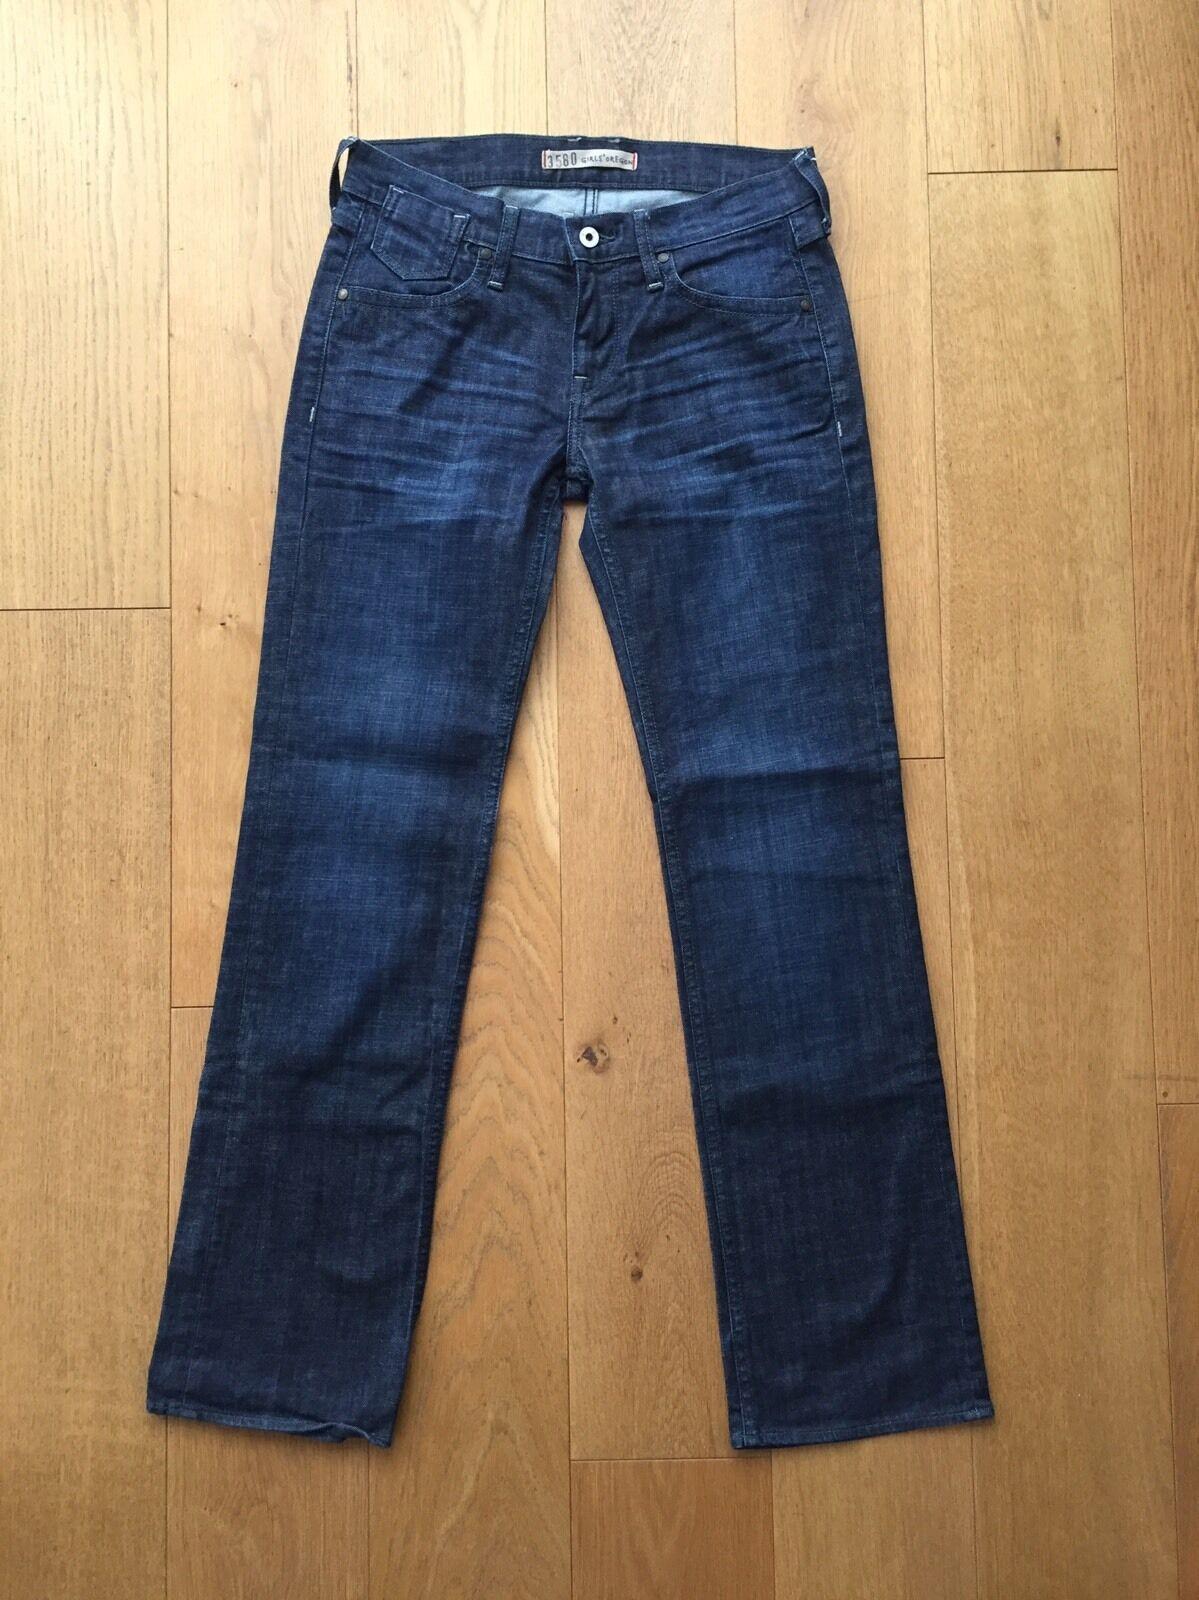 Mustang Jeans Girls Oregon 3580 Gr. 29 32 Hose blau dunkel NEU